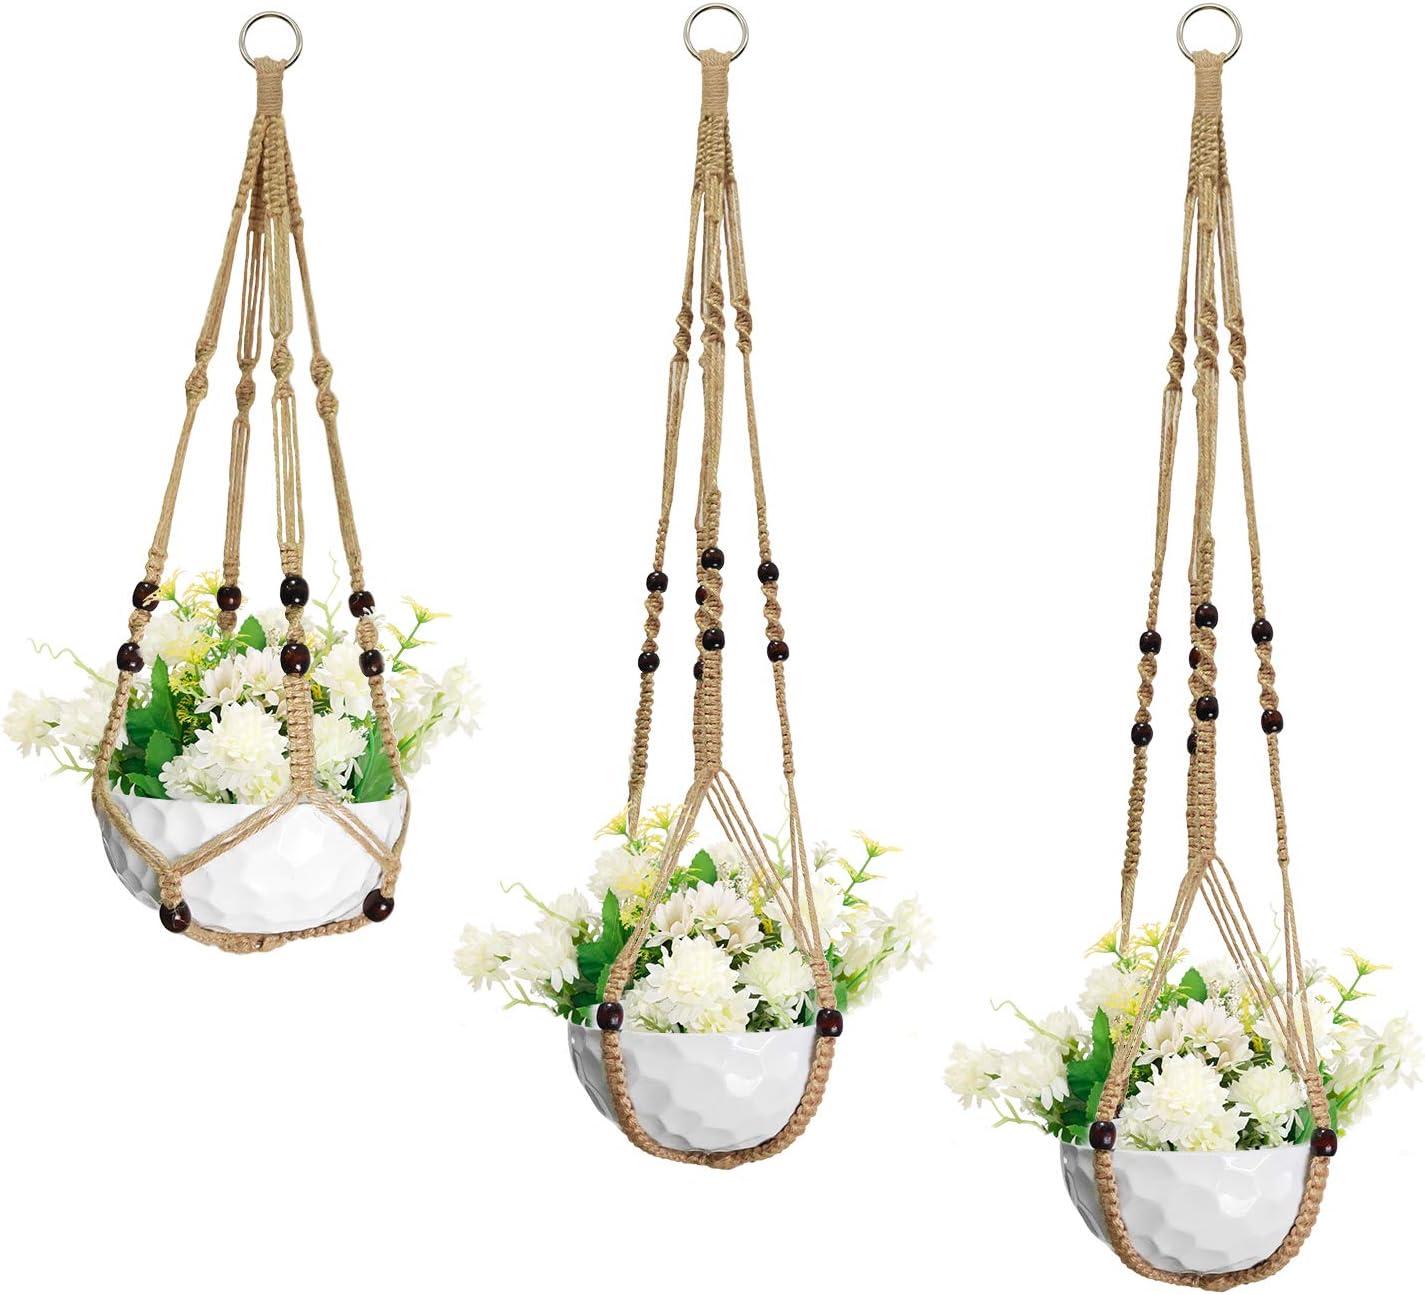 Macrame Plant Hangers San Antonio Mall 3pack 55% OFF Flower Basket Planters Hanging